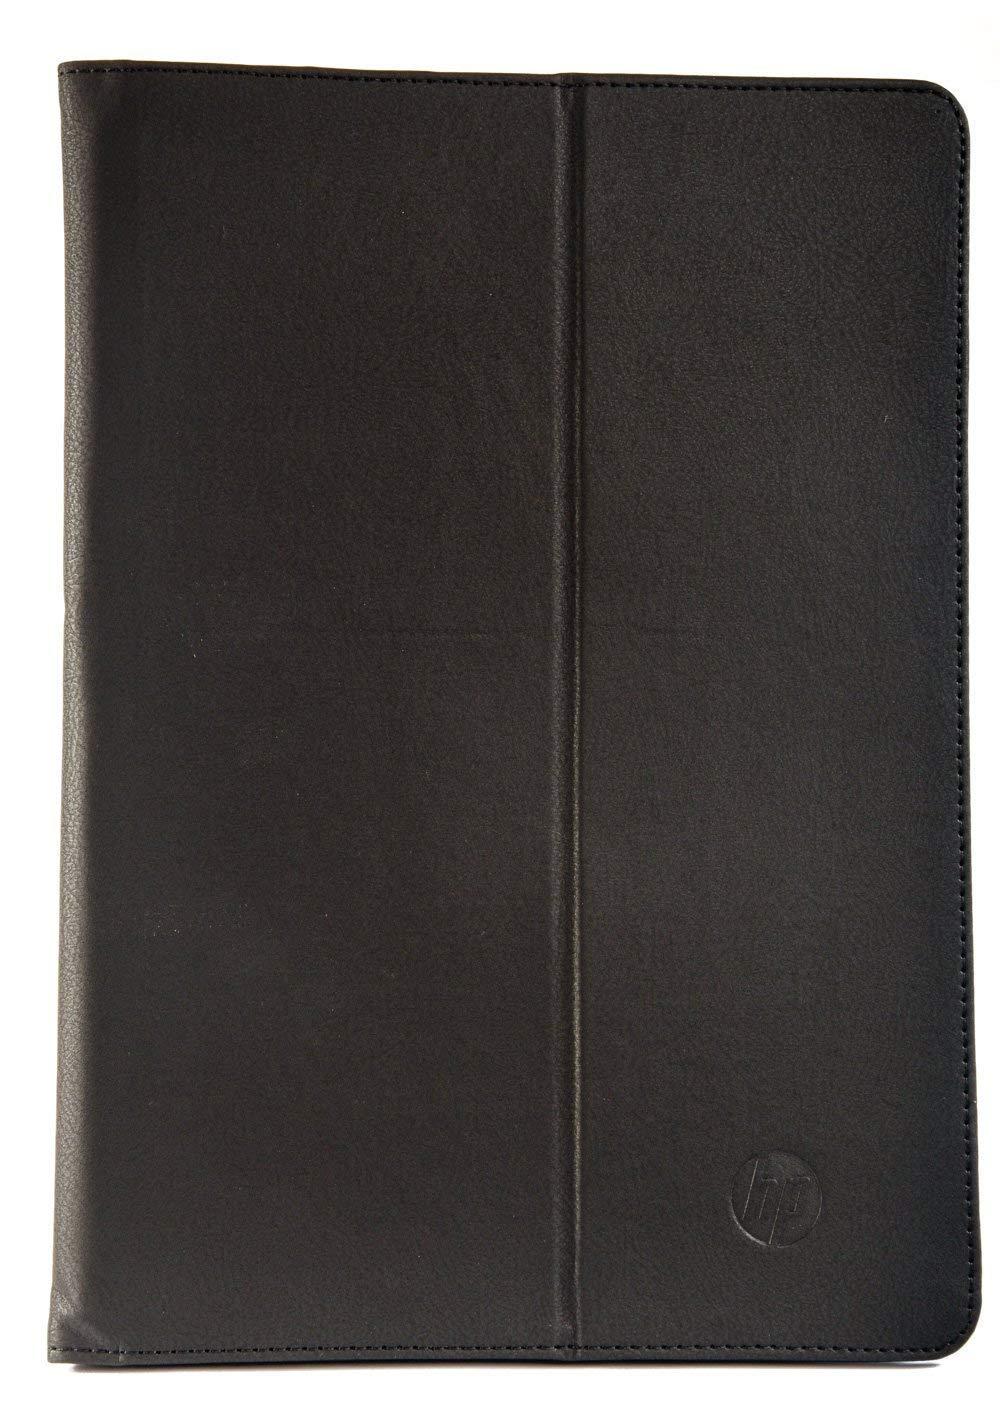 Infomatica PU Leather Flip Folio Case Cover Cum Stand for Omni 10 Tablet  (Omni 10 - Black) - Buy Infomatica PU Leather Flip Folio Case Cover Cum  Stand for ...